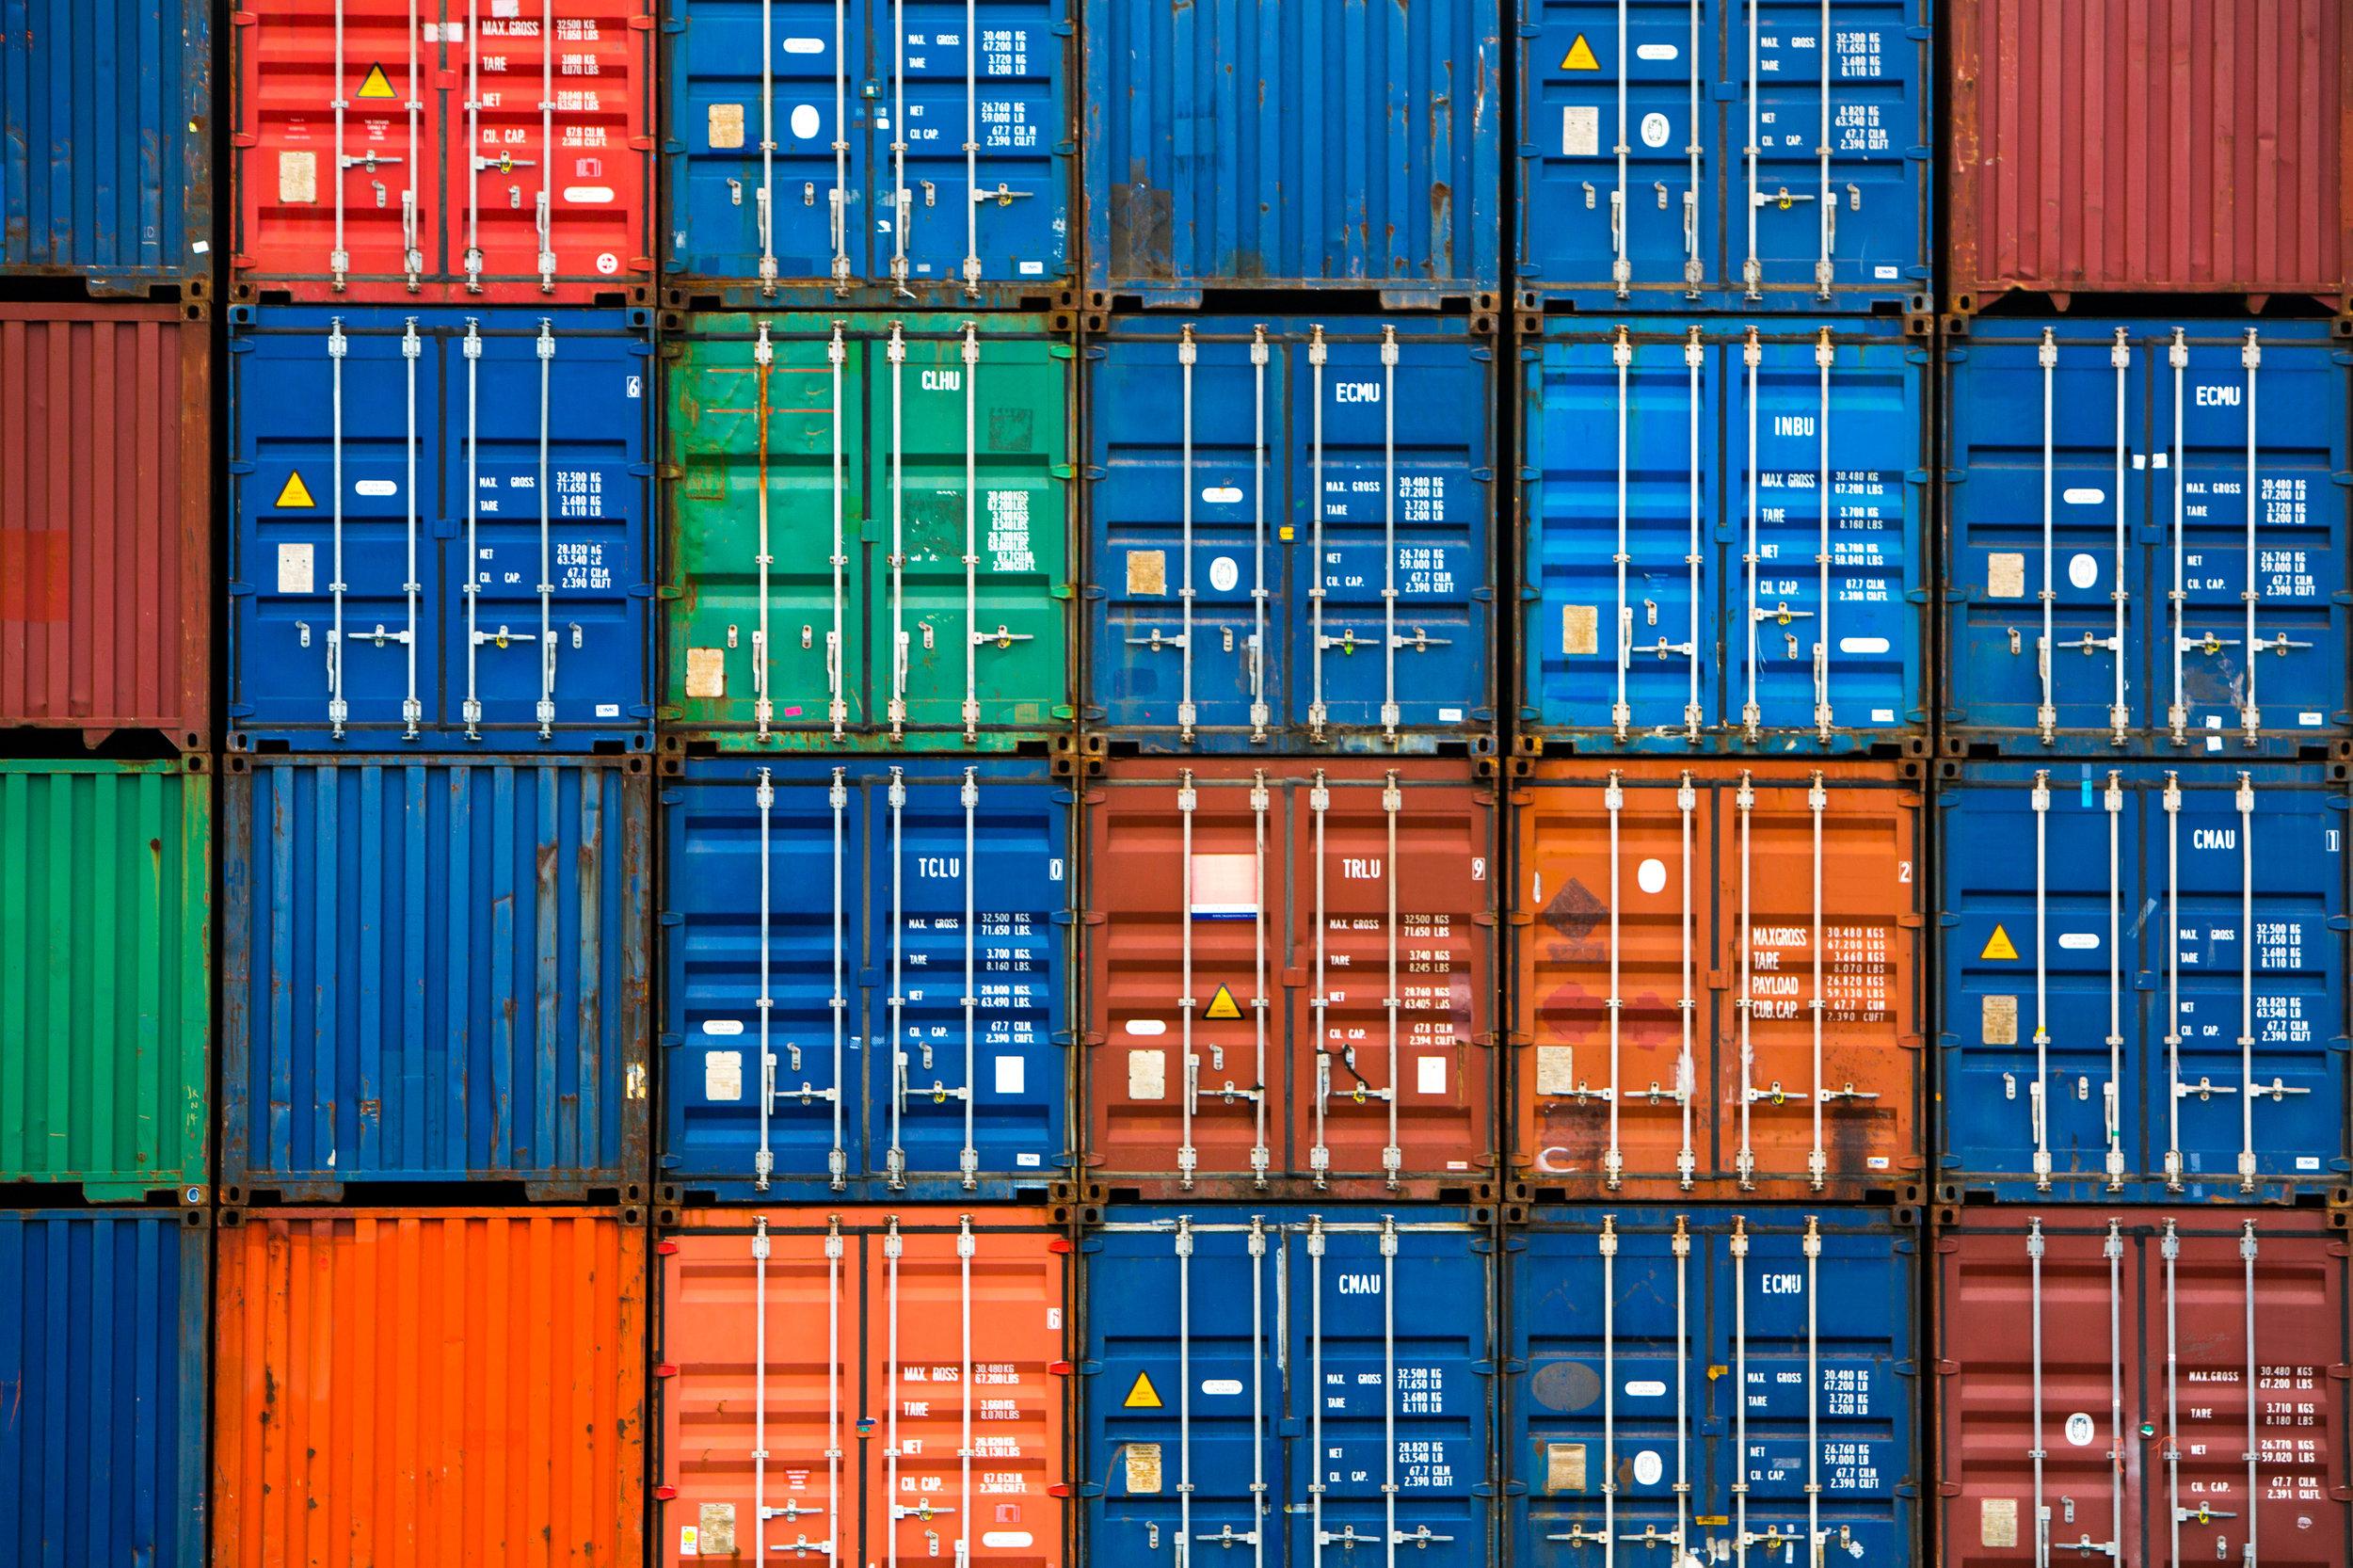 Do You Transport Any Goods Domestically or Internationally? - September 2017